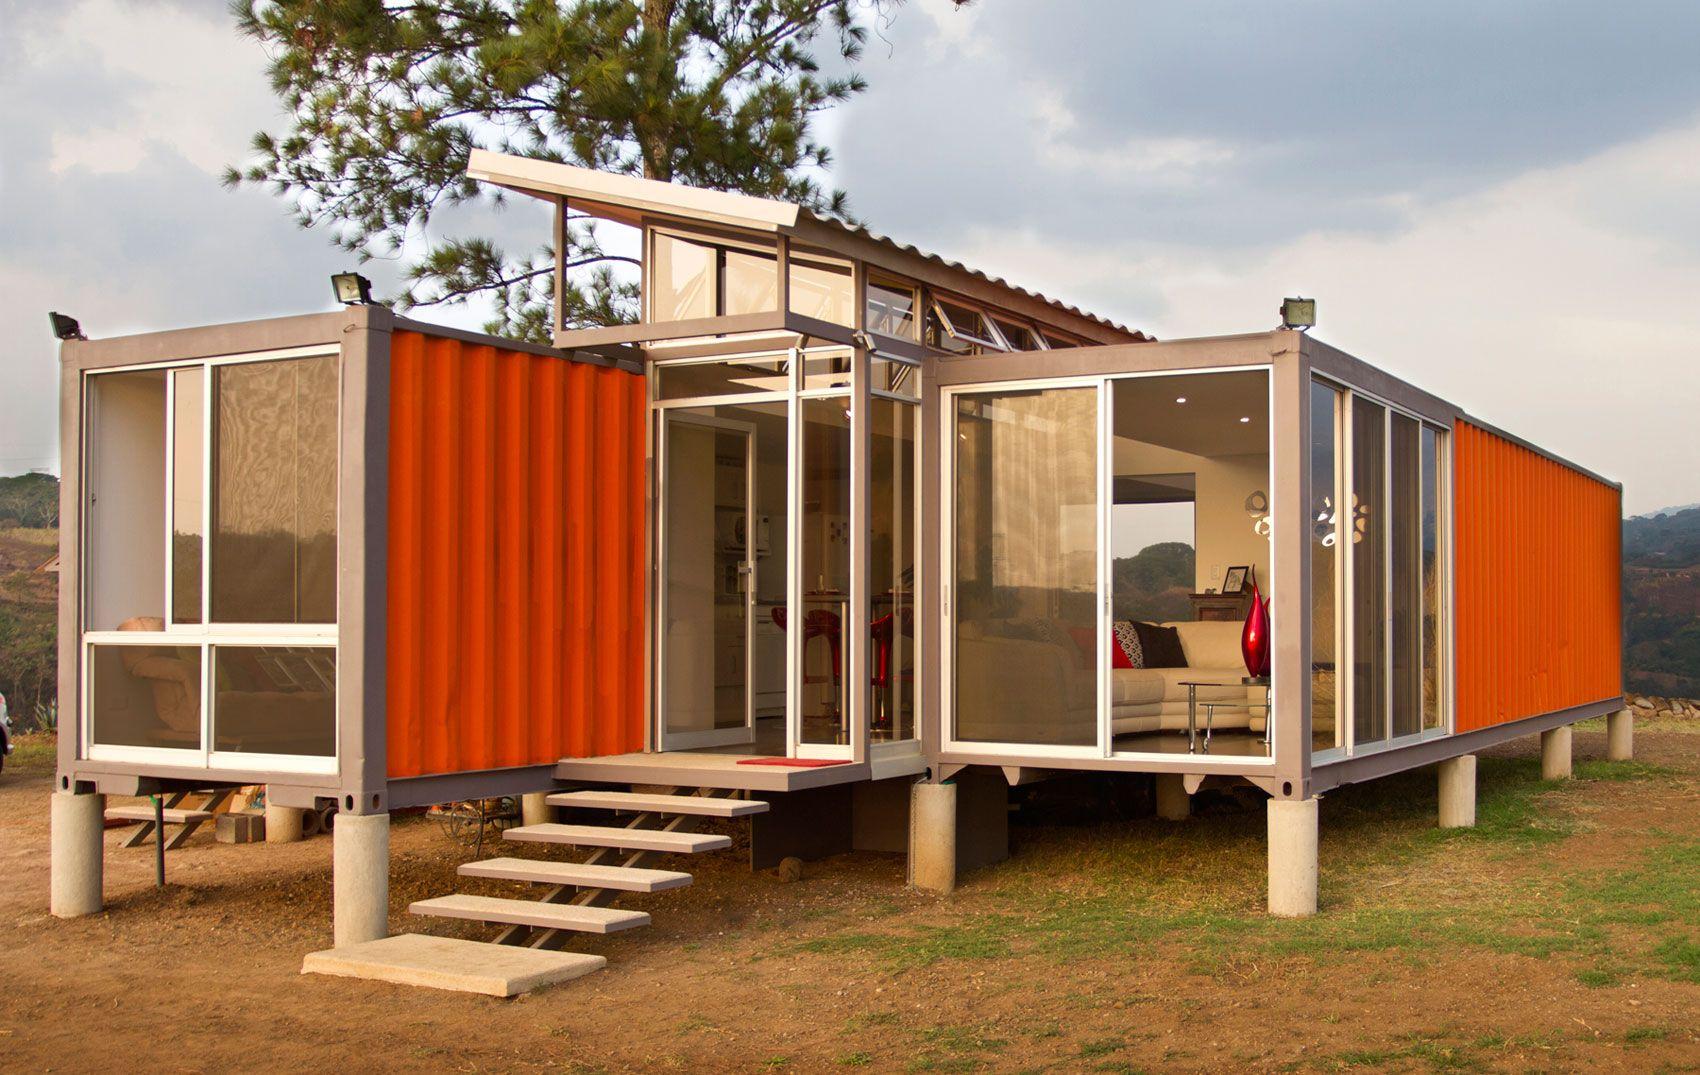 Best Kitchen Gallery: Architect Amazing Container Design Architecture Small Container of Small Container Homes  on rachelxblog.com